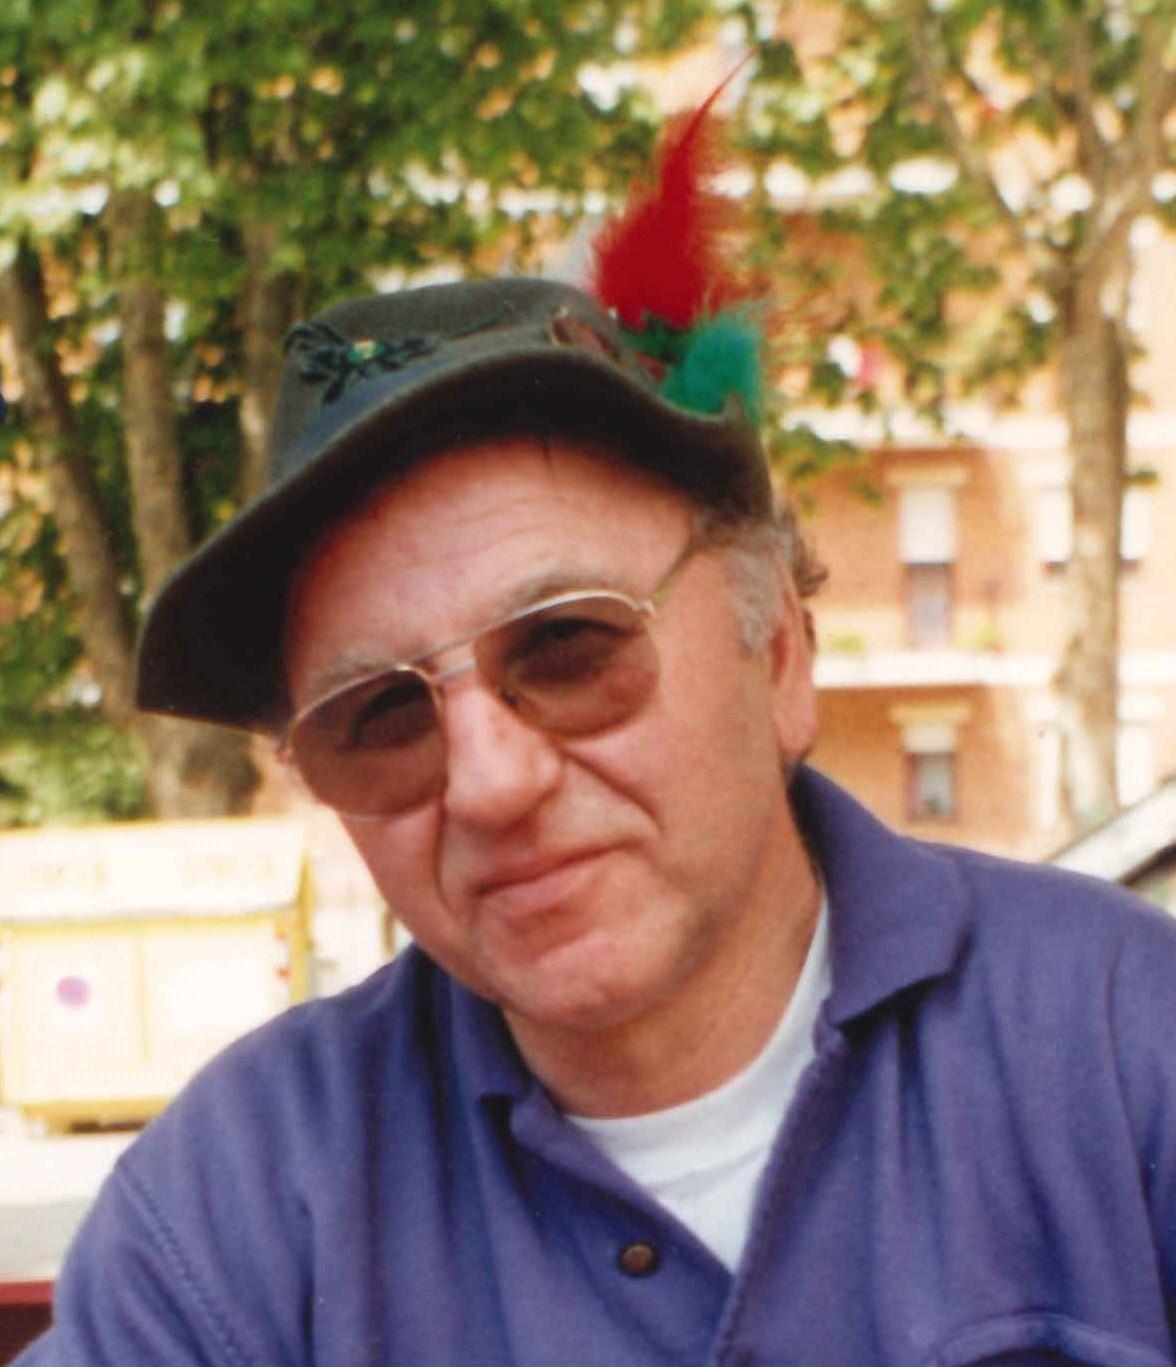 Lanfranco Grossutti